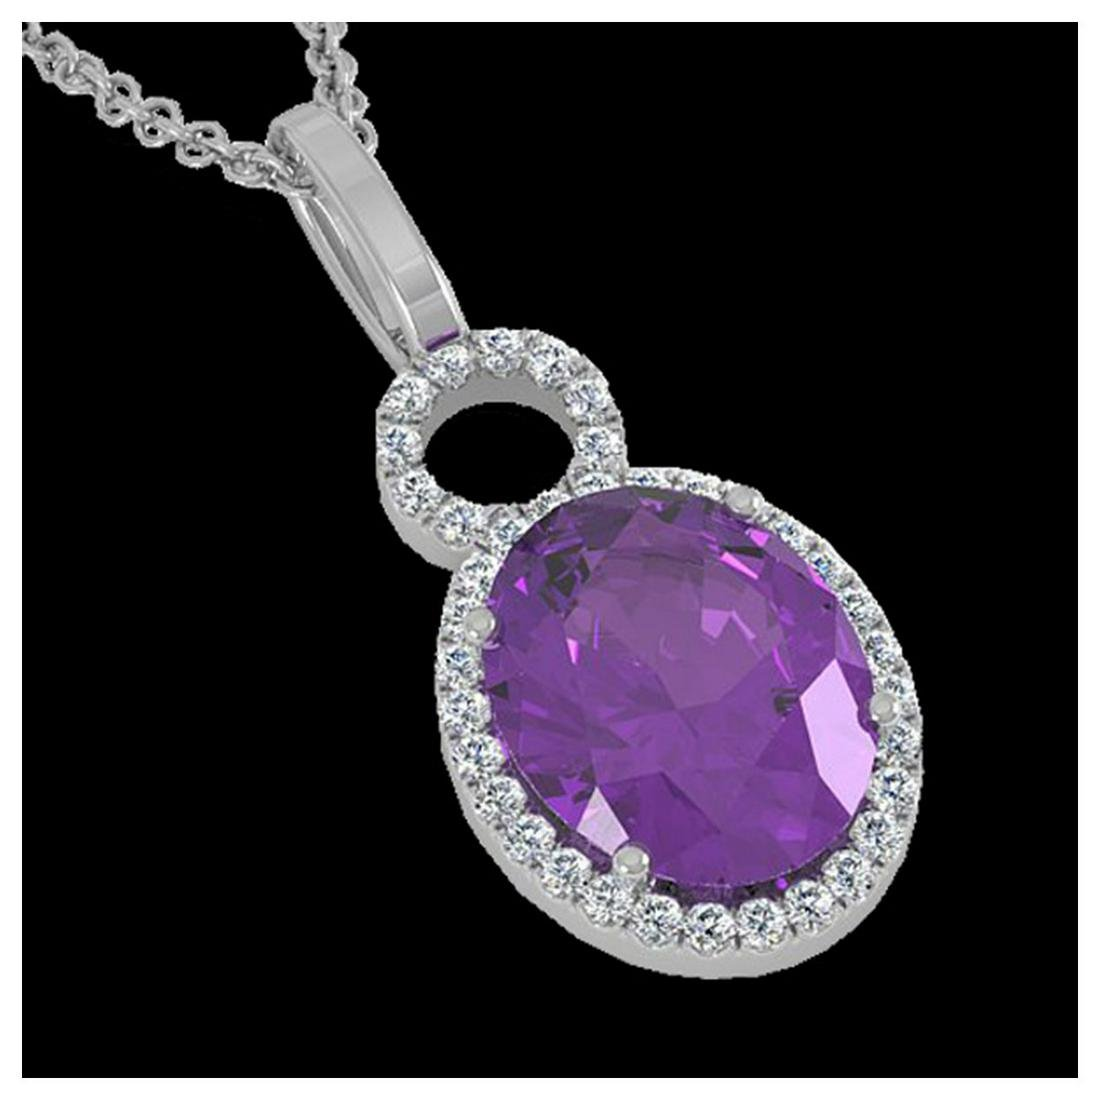 3 ctw Amethyst & VS/SI Diamond Necklace 14K White Gold